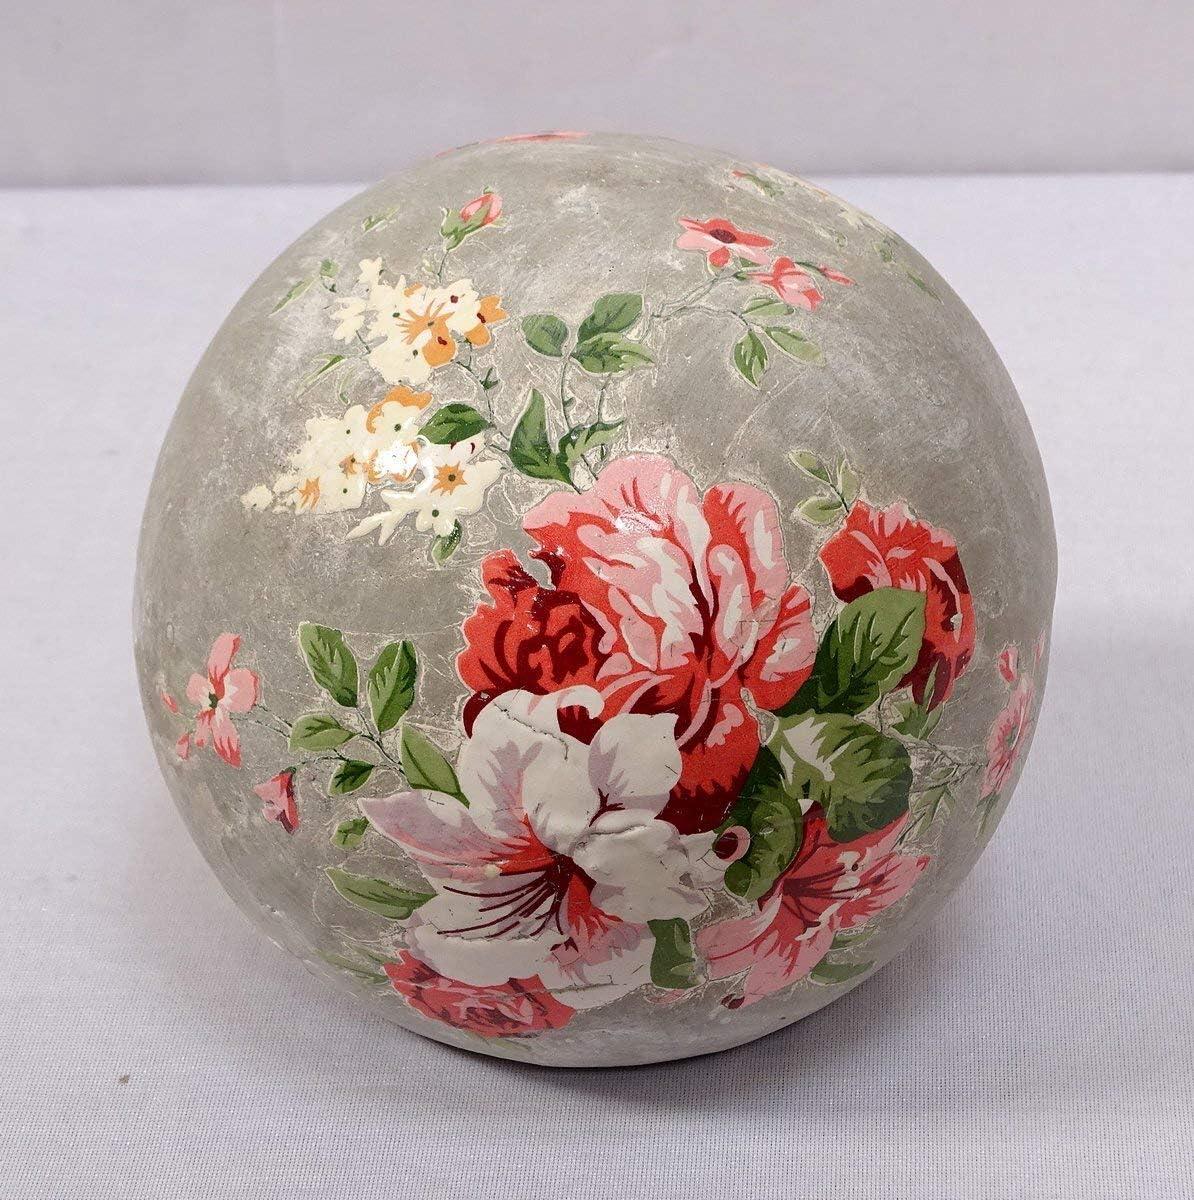 Terrakotta Gartenkugel mit Blumenmuster Landhaus Beet-Kugel 12 cm Rosenkugel